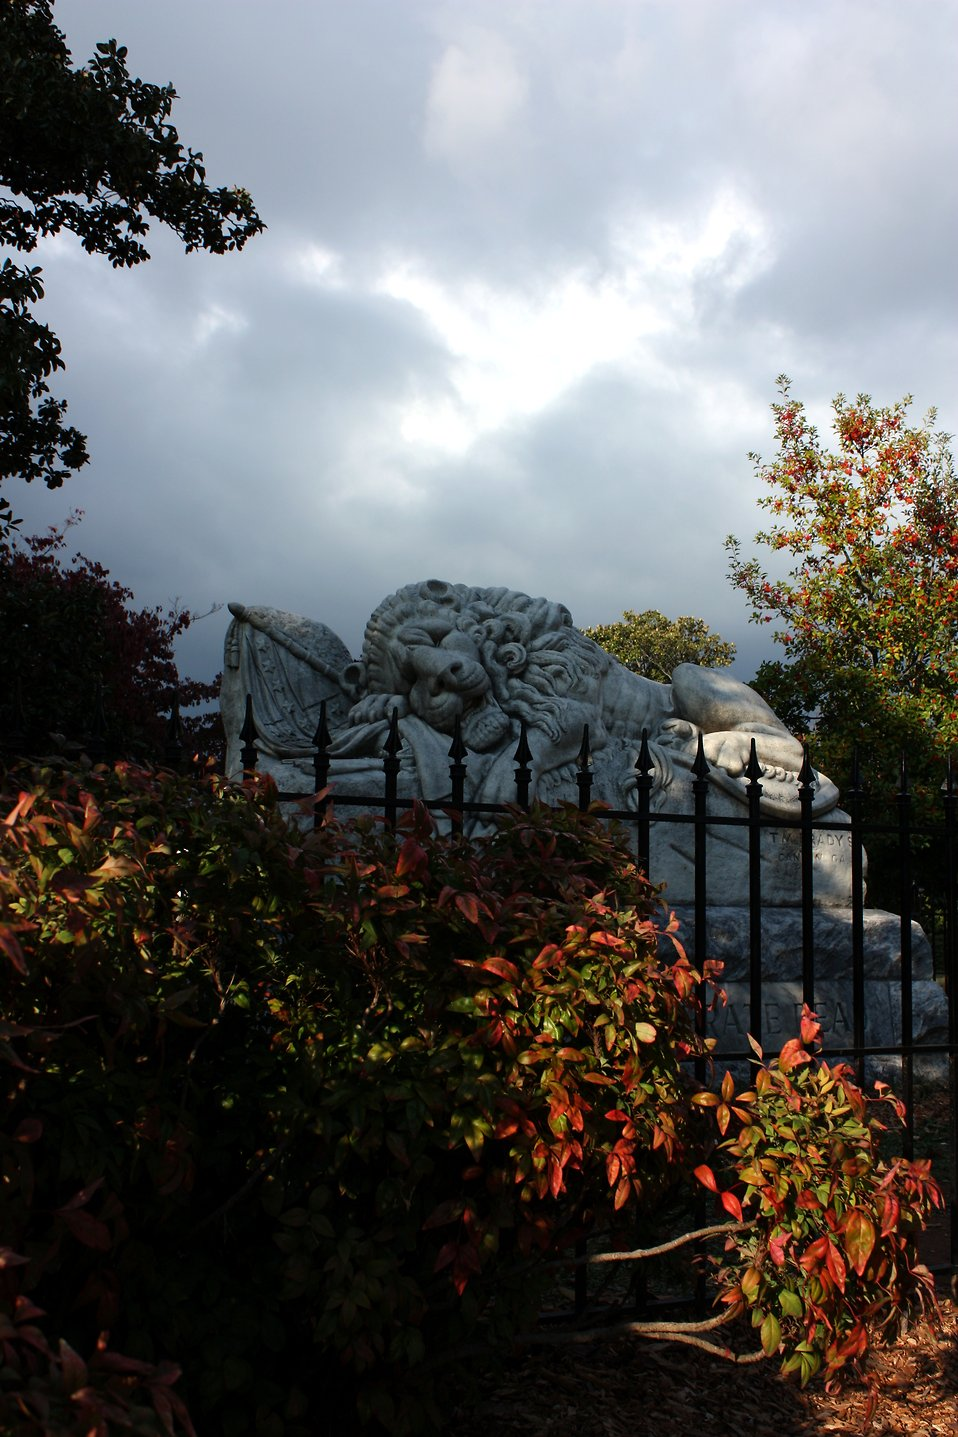 The Lion of Atlanta statue at historic Oakland Cemetery in Atlanta, Georgia : Free Stock Photo